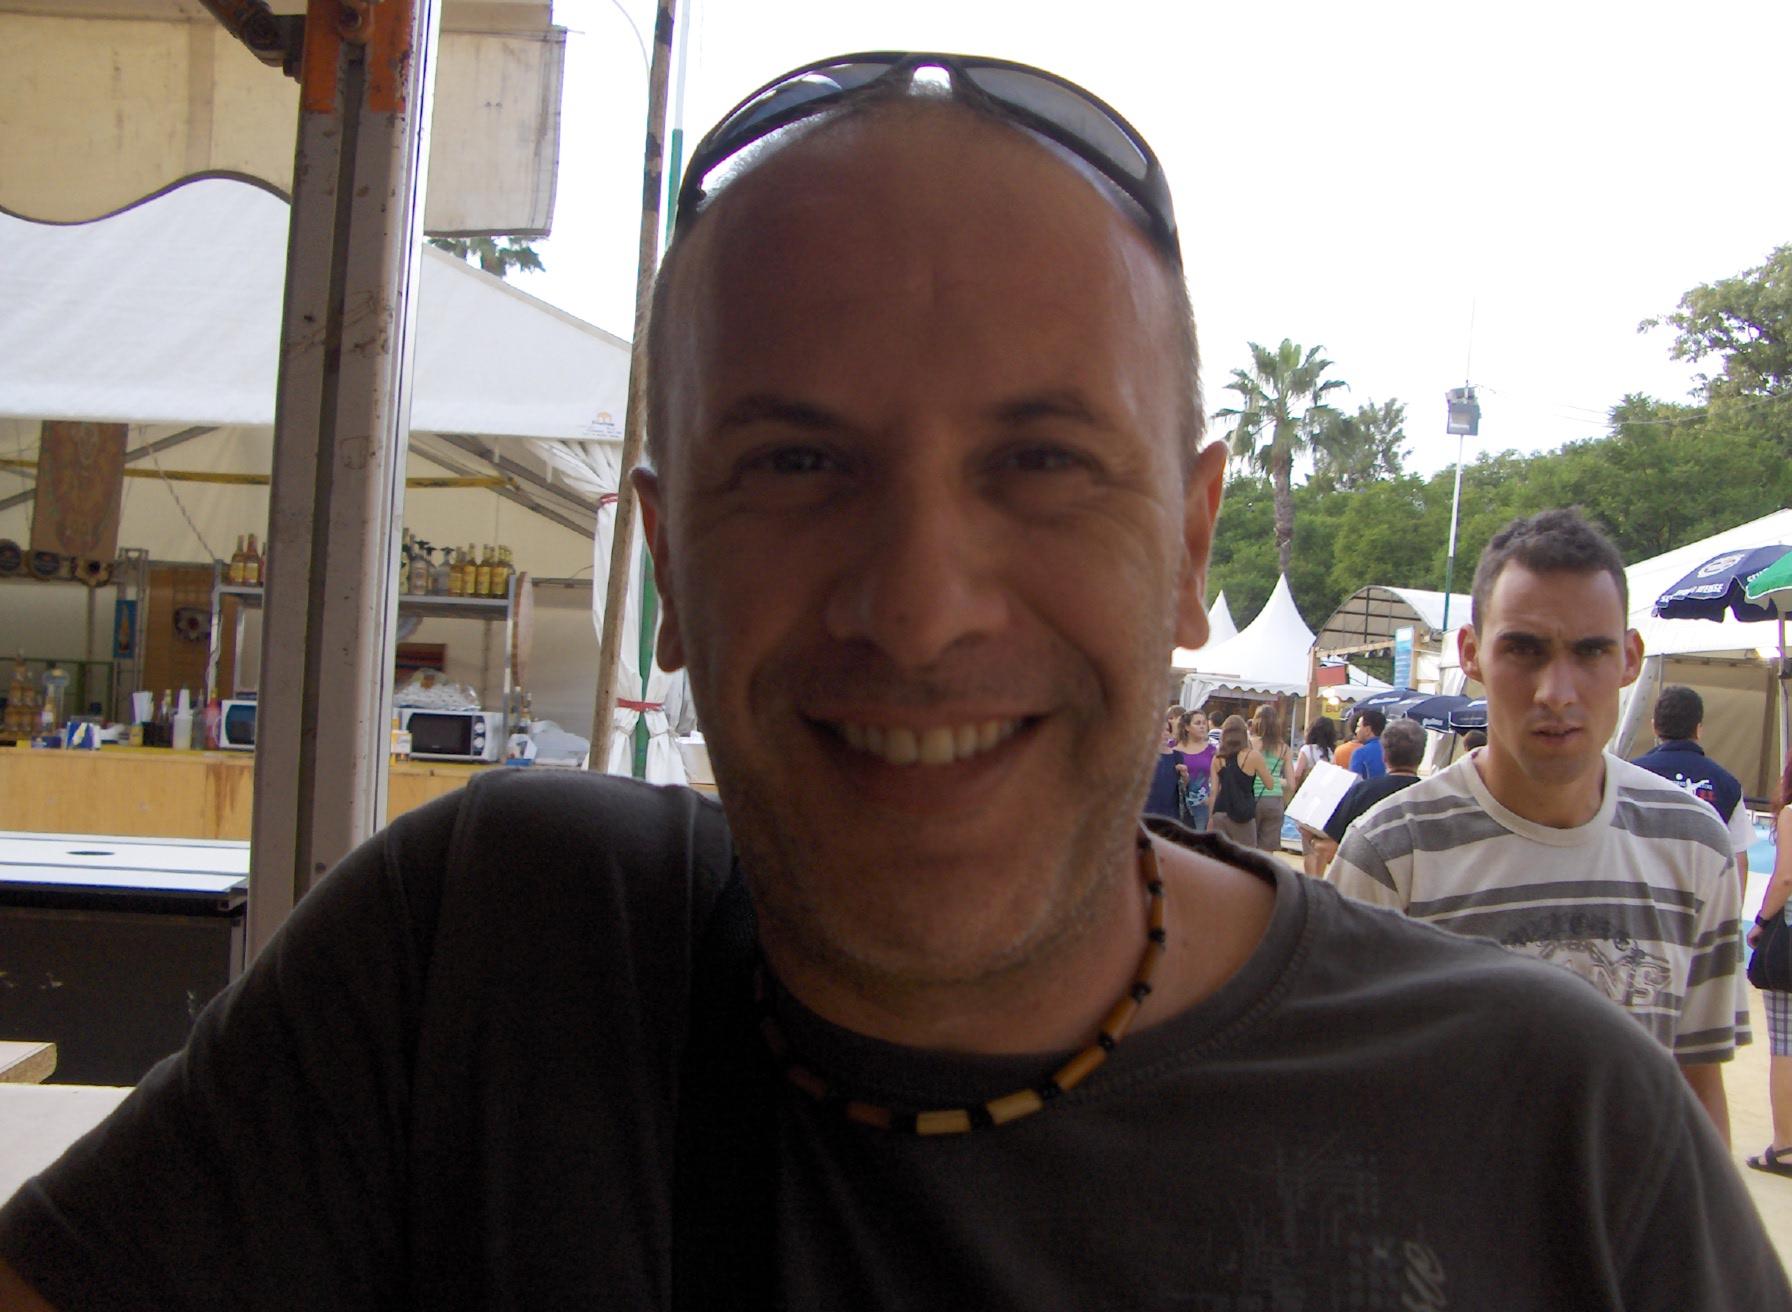 ANTONIO GARDEL